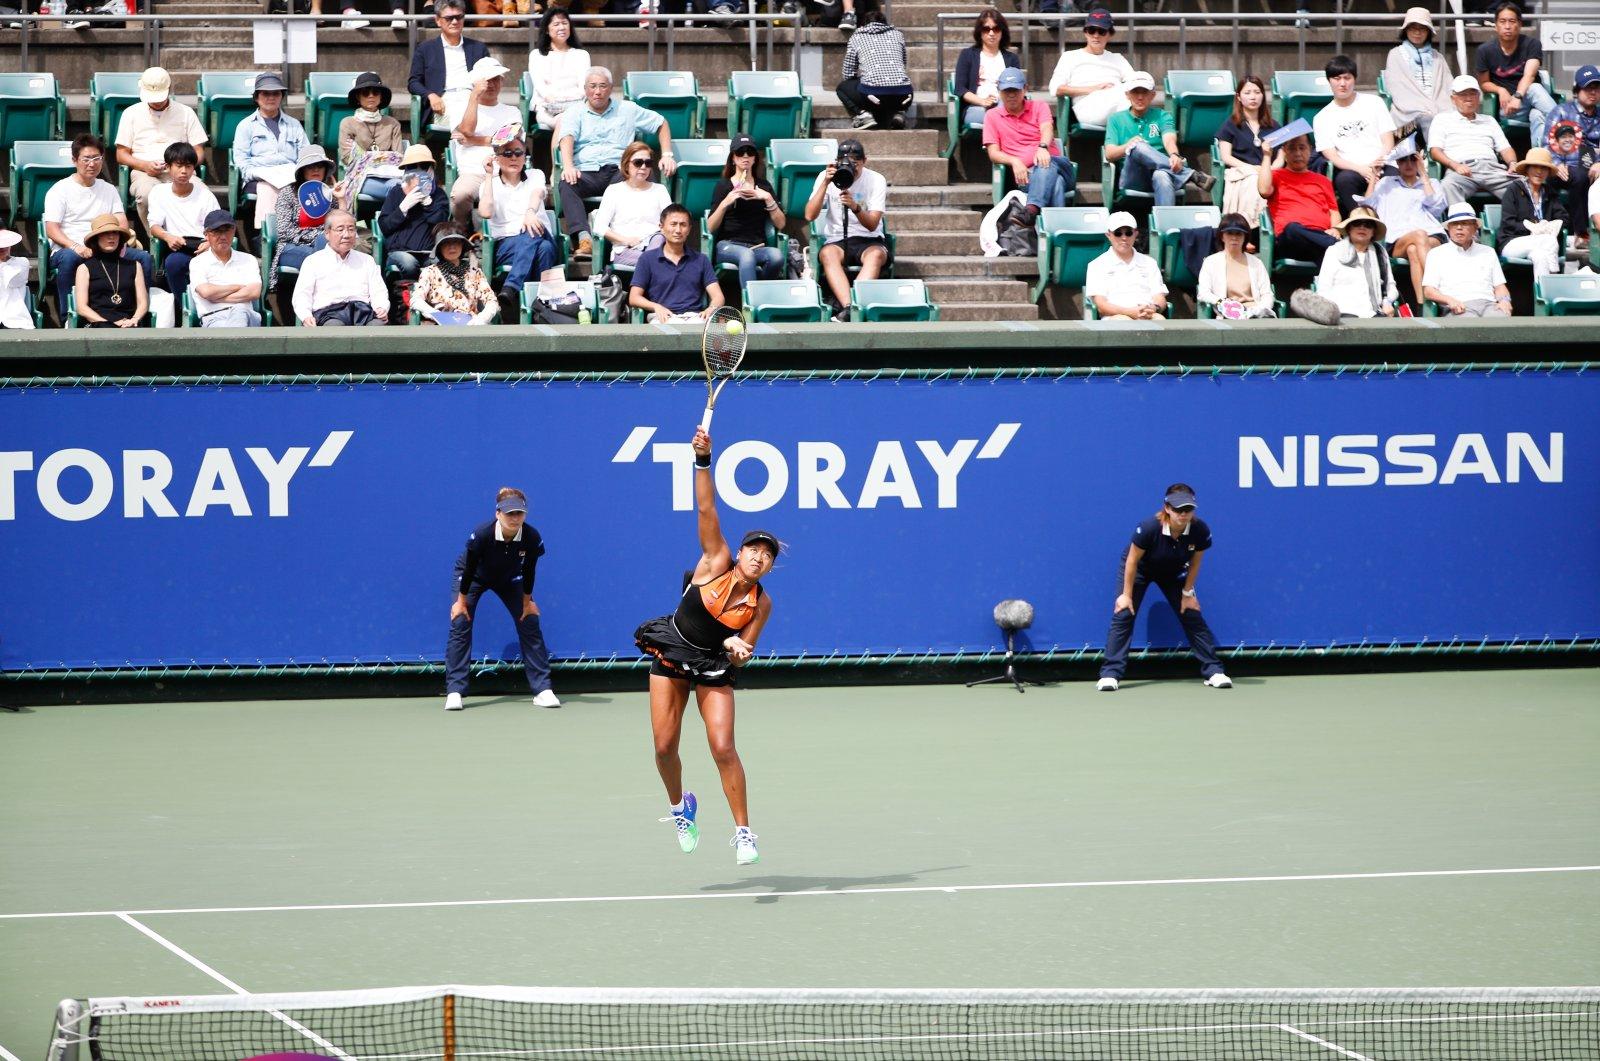 Naomi Osaka serves during the Toray Pan Pacific Open final in Osaka, Japan, Sept. 22, 2019. (Reuters Photo)